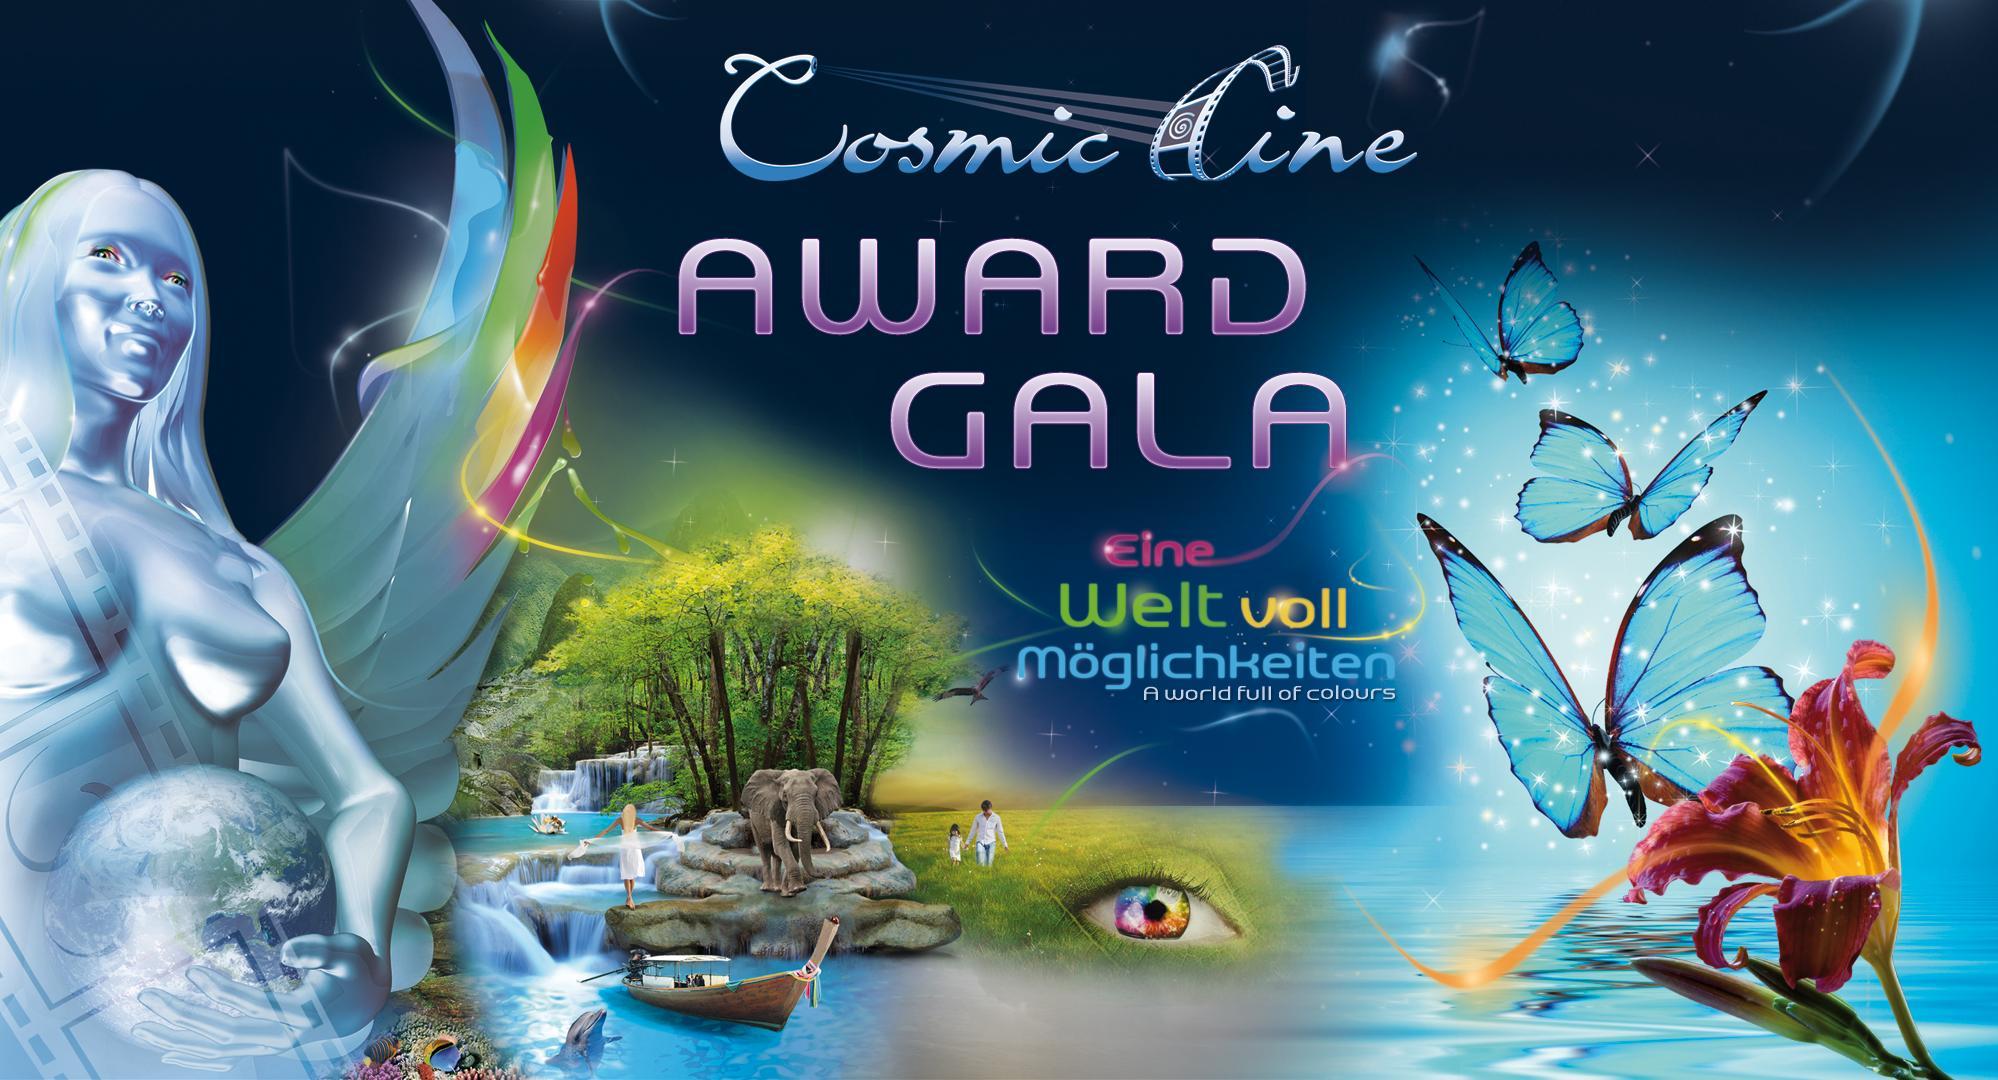 00 Cosmic Cine AWARD GALA - Cosmic Angel Awards 2013